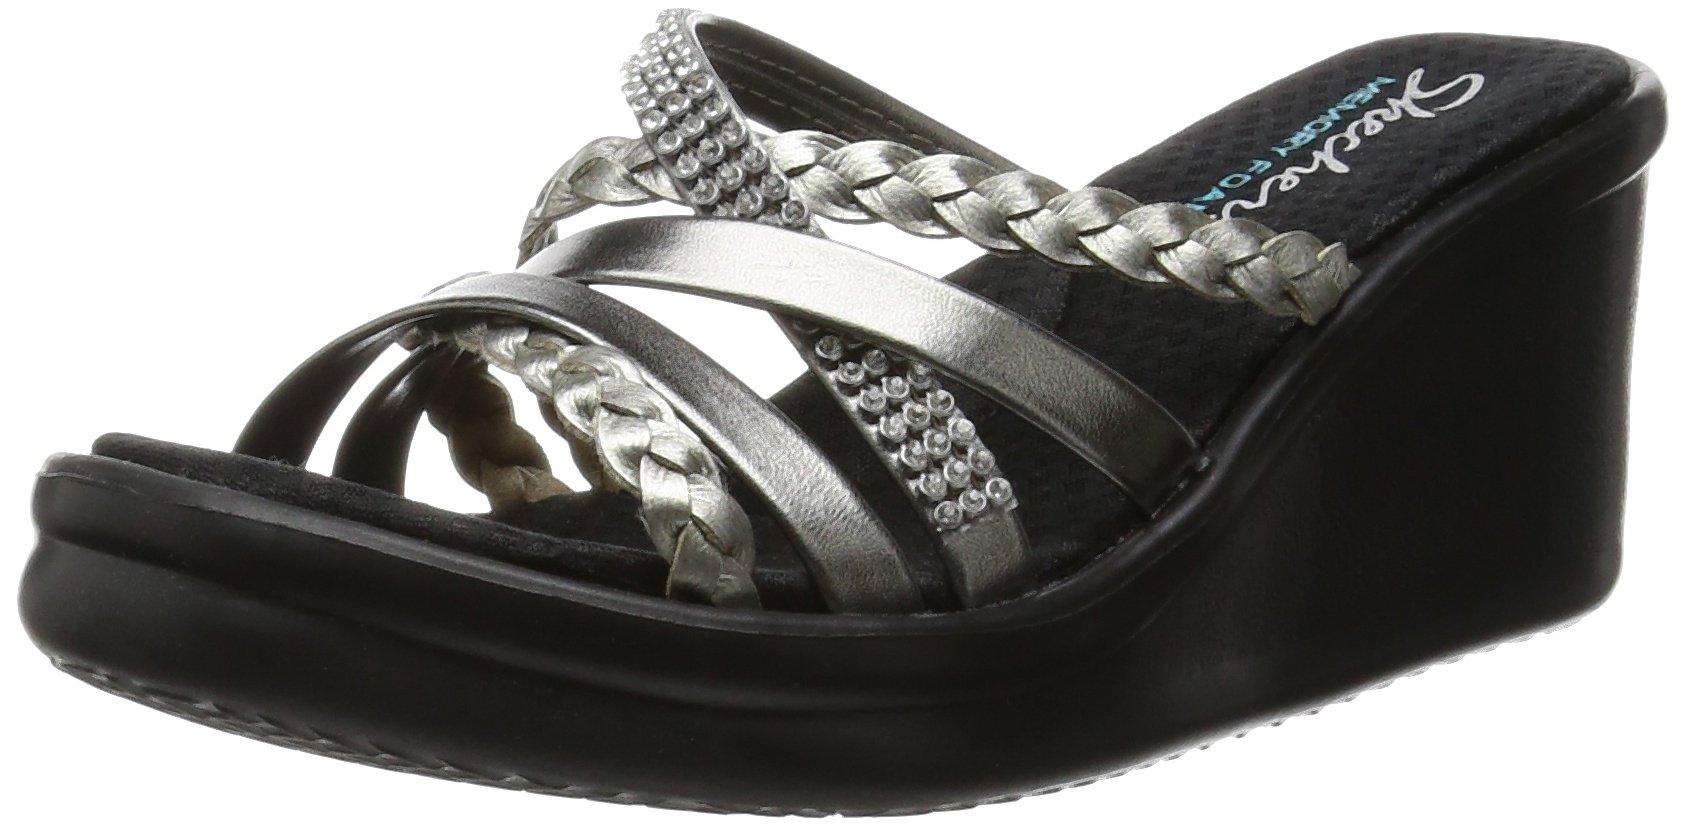 Skechers Cali Women's Rumbers-Wild Child Wedge Sandal,Pewter Rhinestone,8 M US